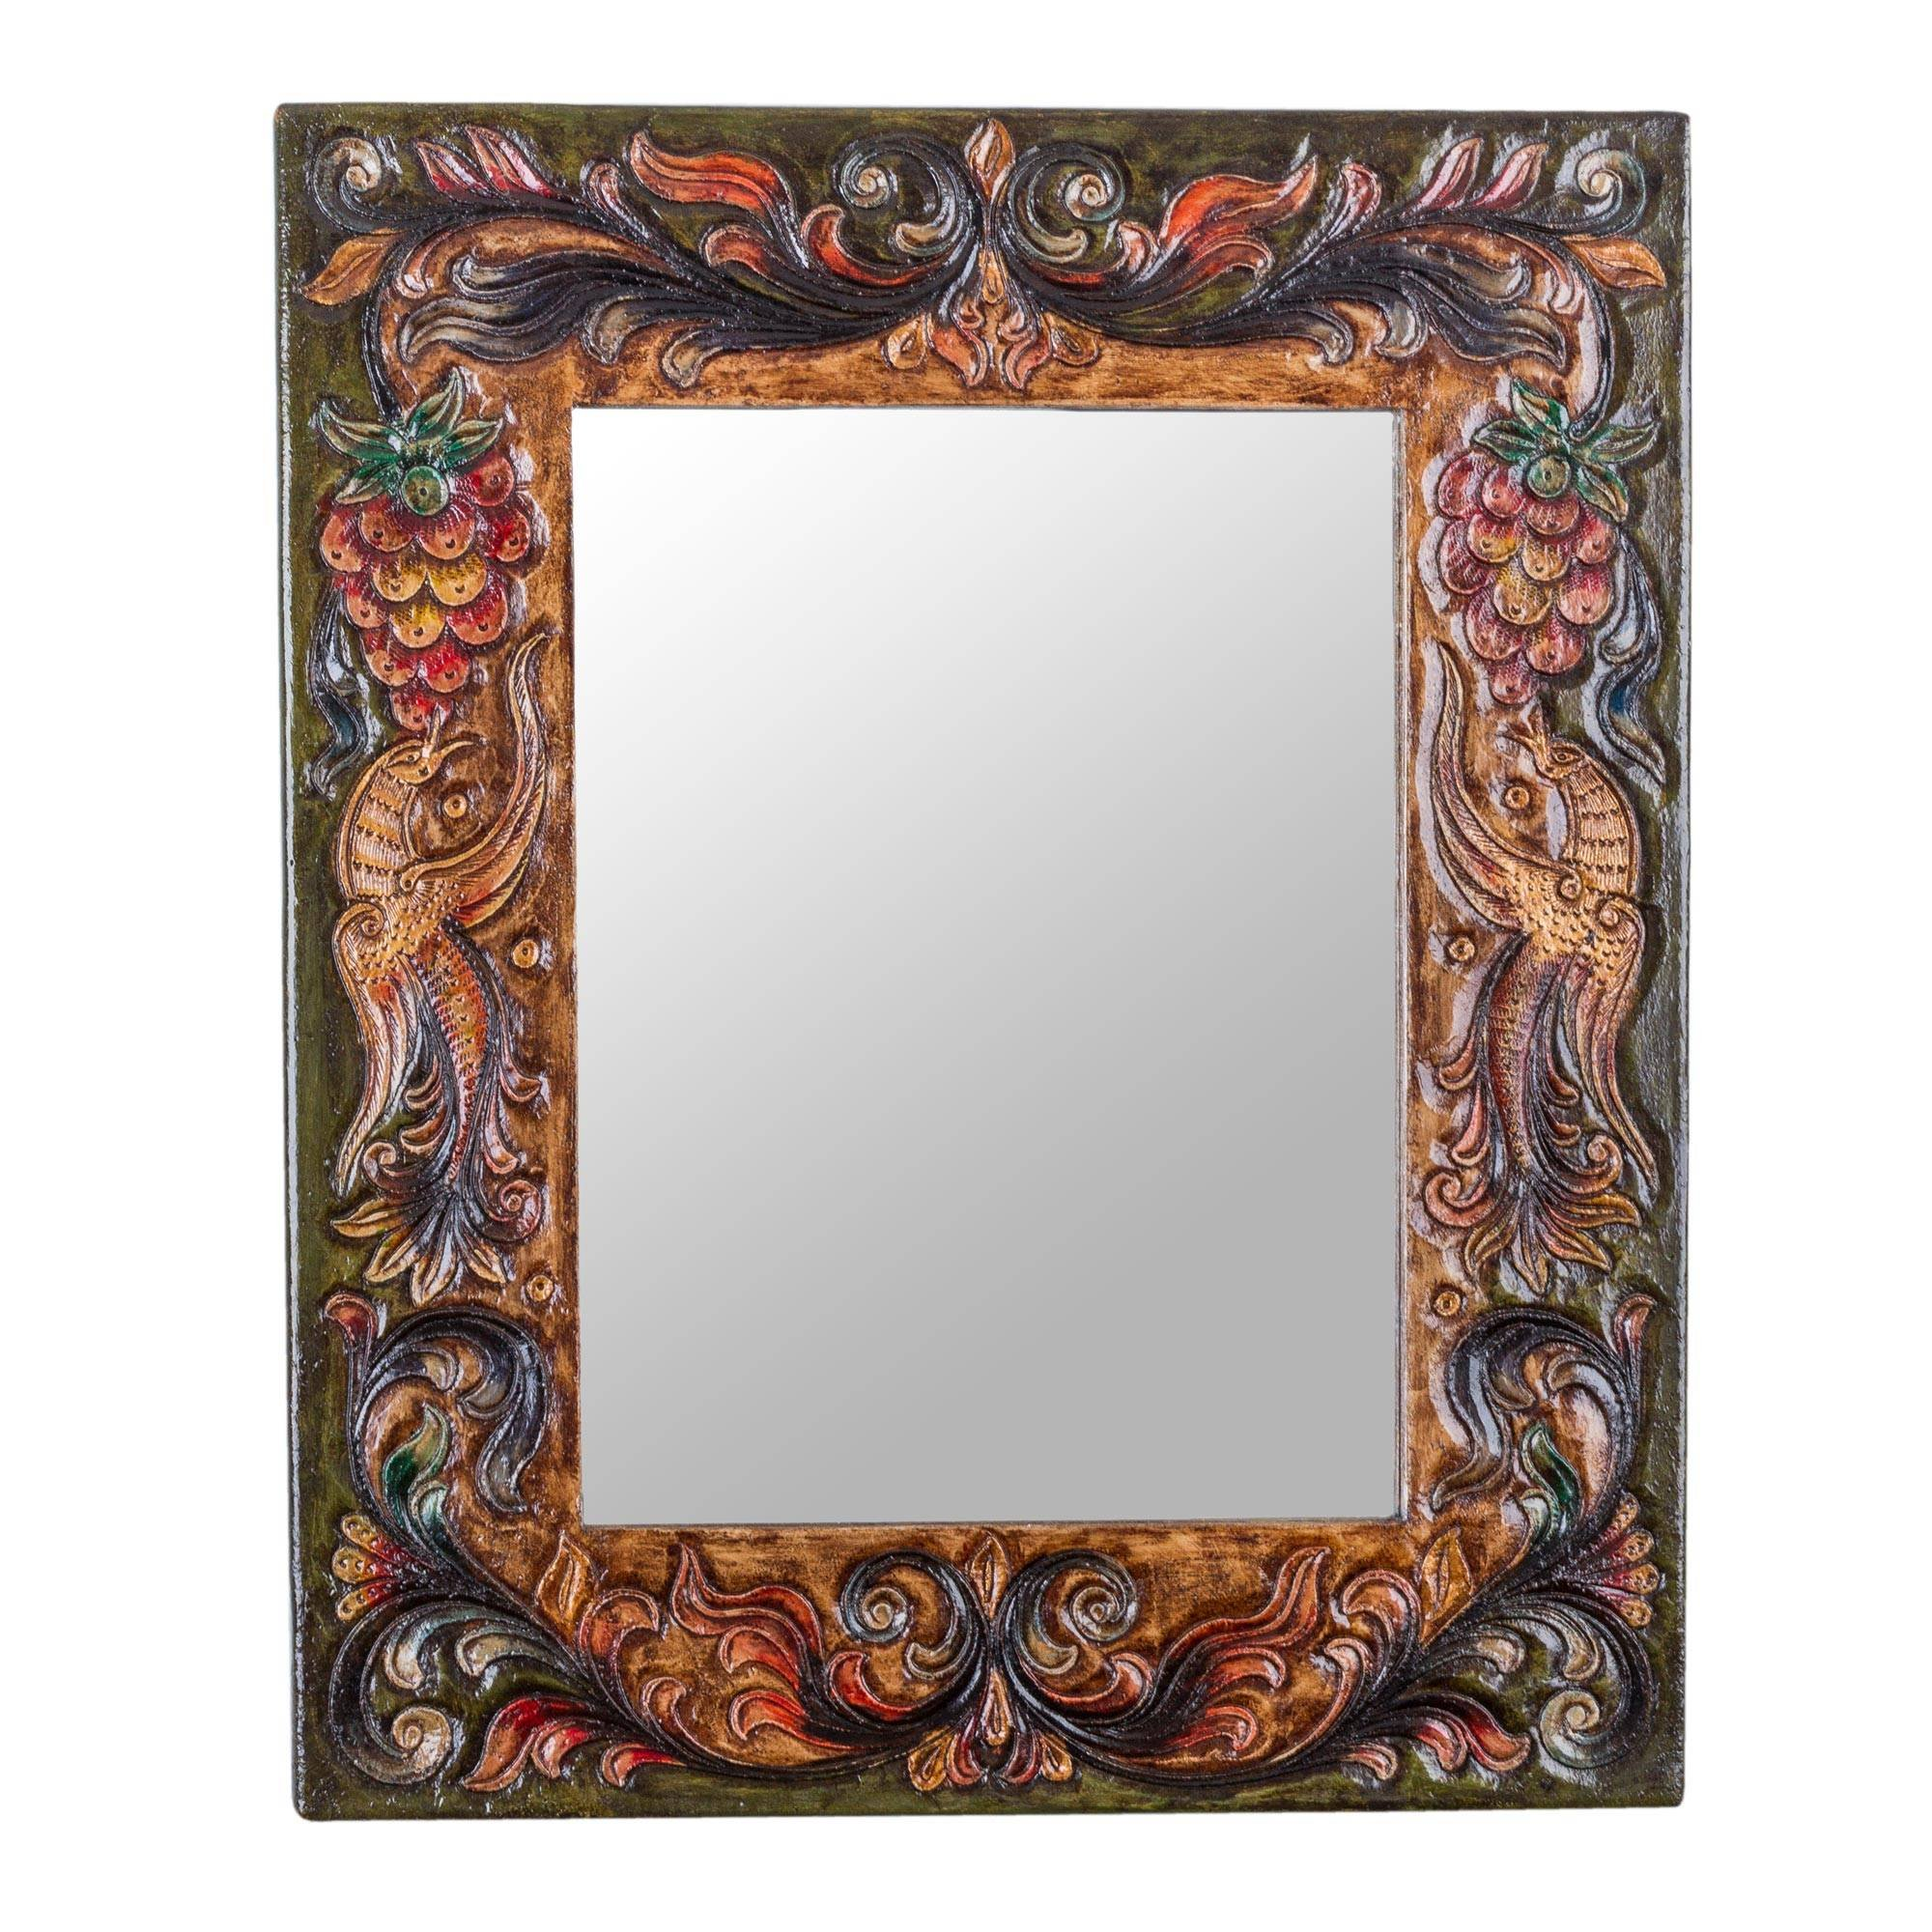 NOVICA Animal Themed Wood Wall Mounted Mirror, Multicolor 'Luminous Rebirth'